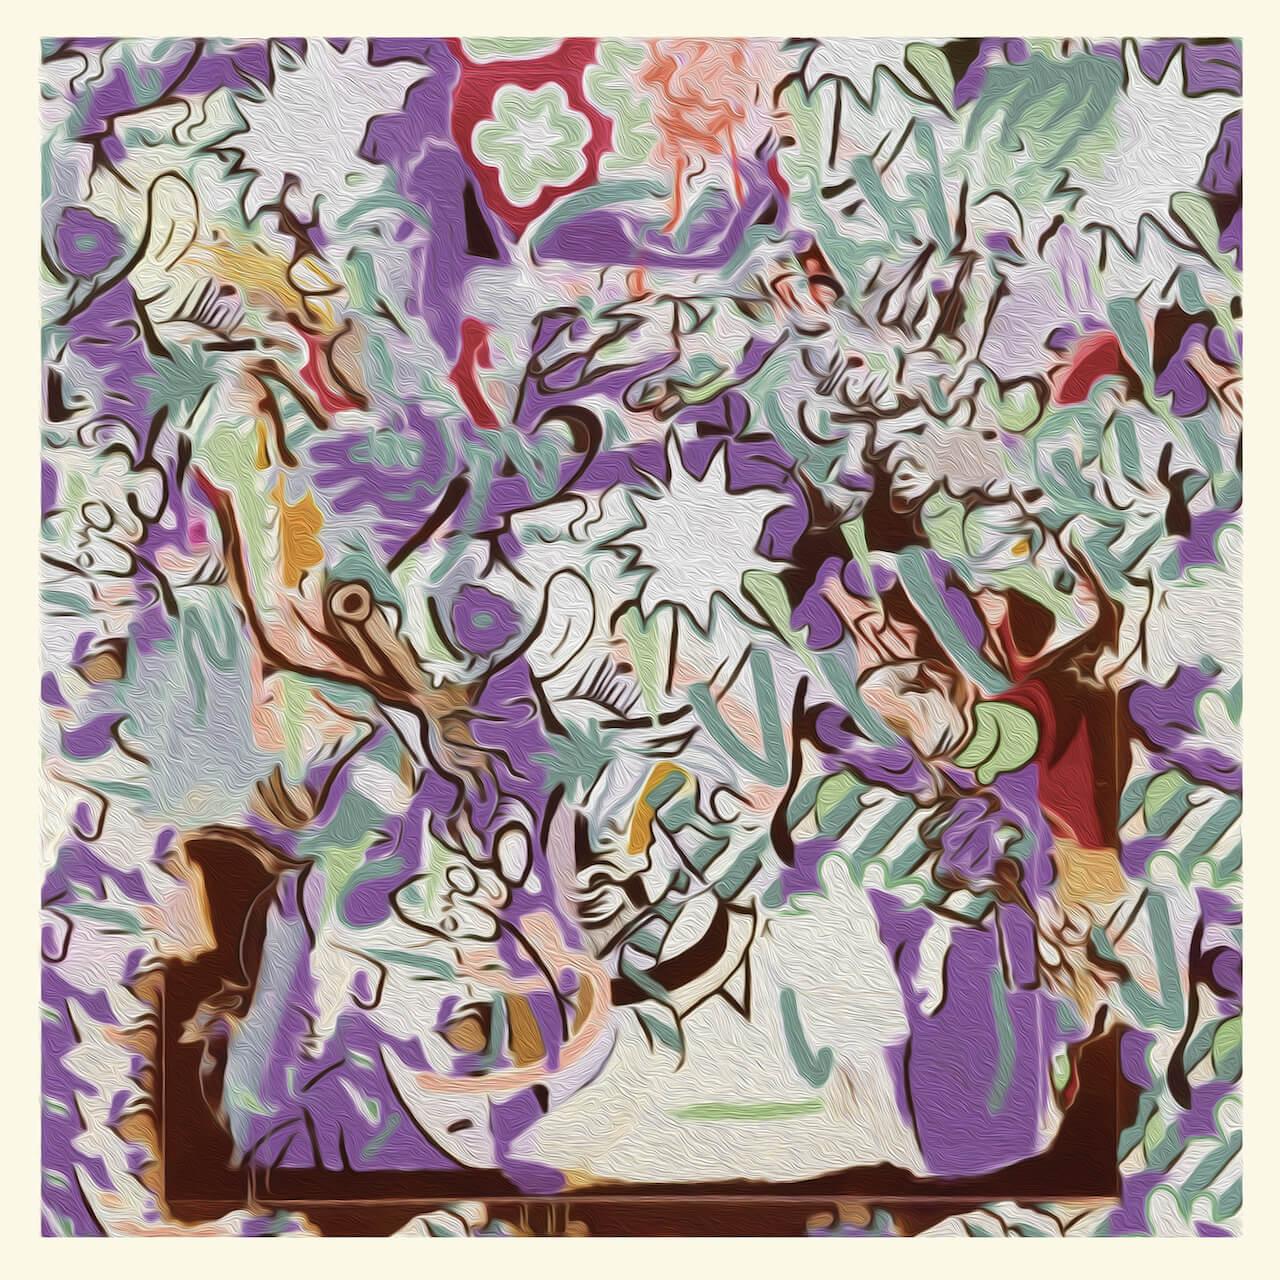 Mild High Clubの最新作『Going Going Gone』が〈Stones Throw〉からリリース music210917-mildhighclub-goinggoinggone-4